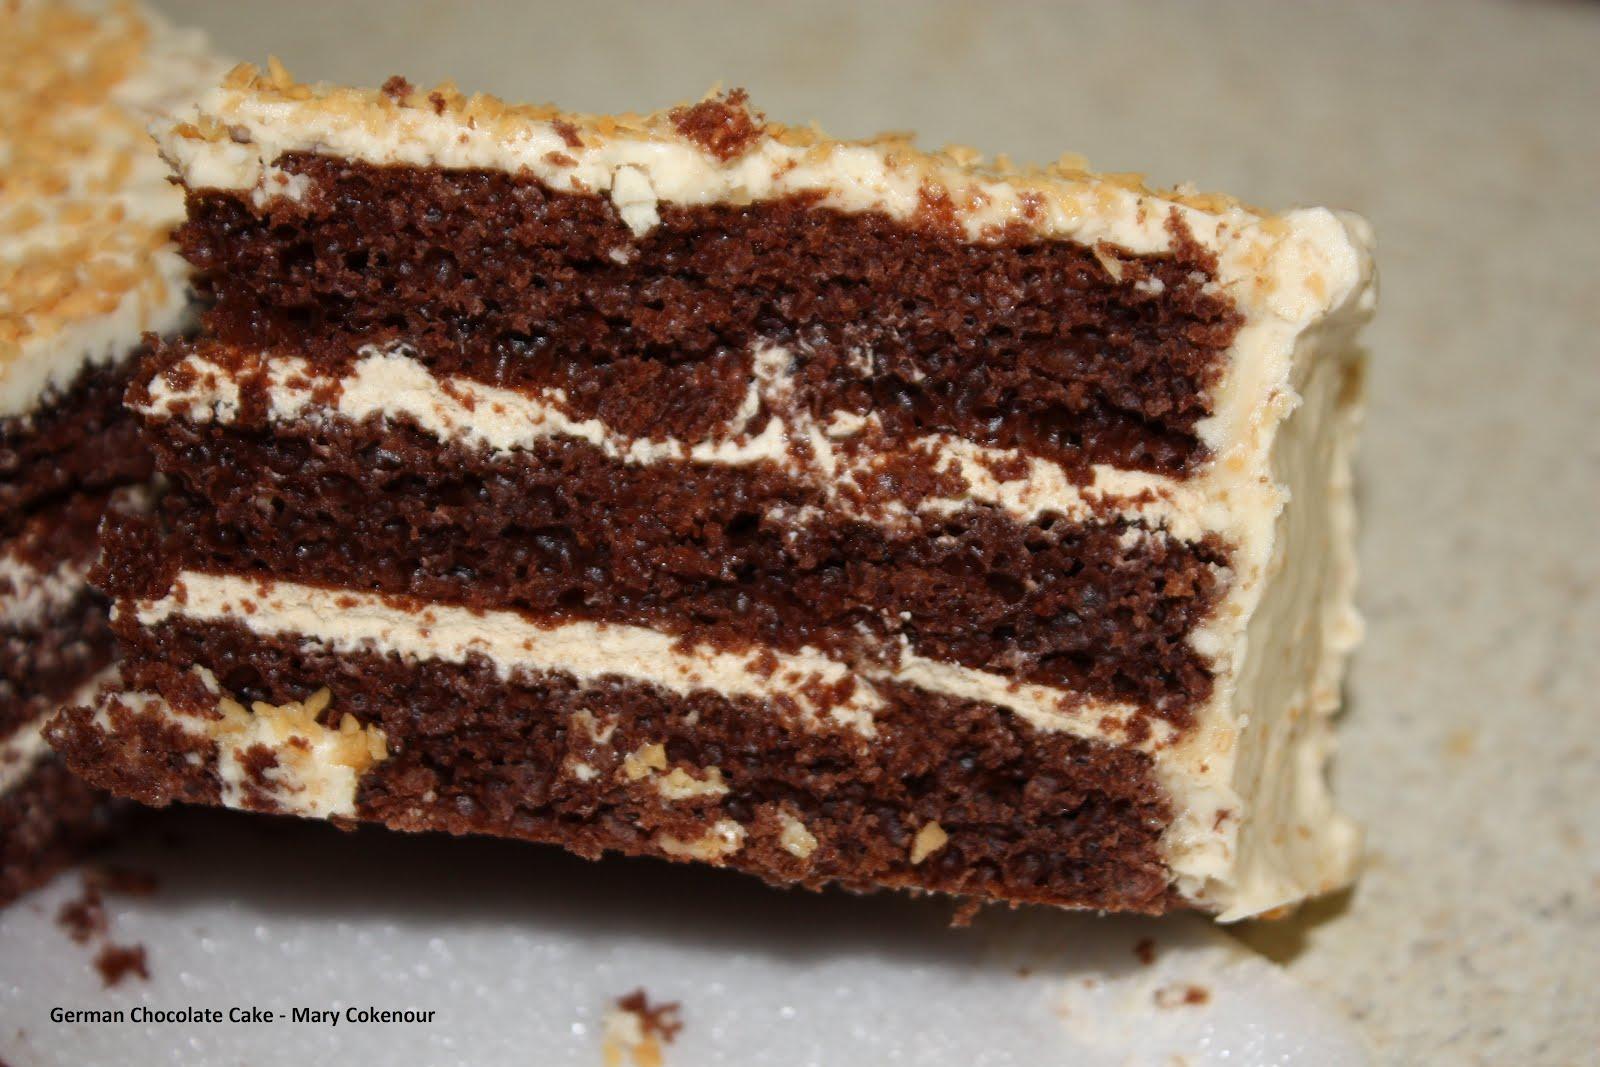 Food Adventures of a Comfort Cook: The Original German Chocolate Cake.